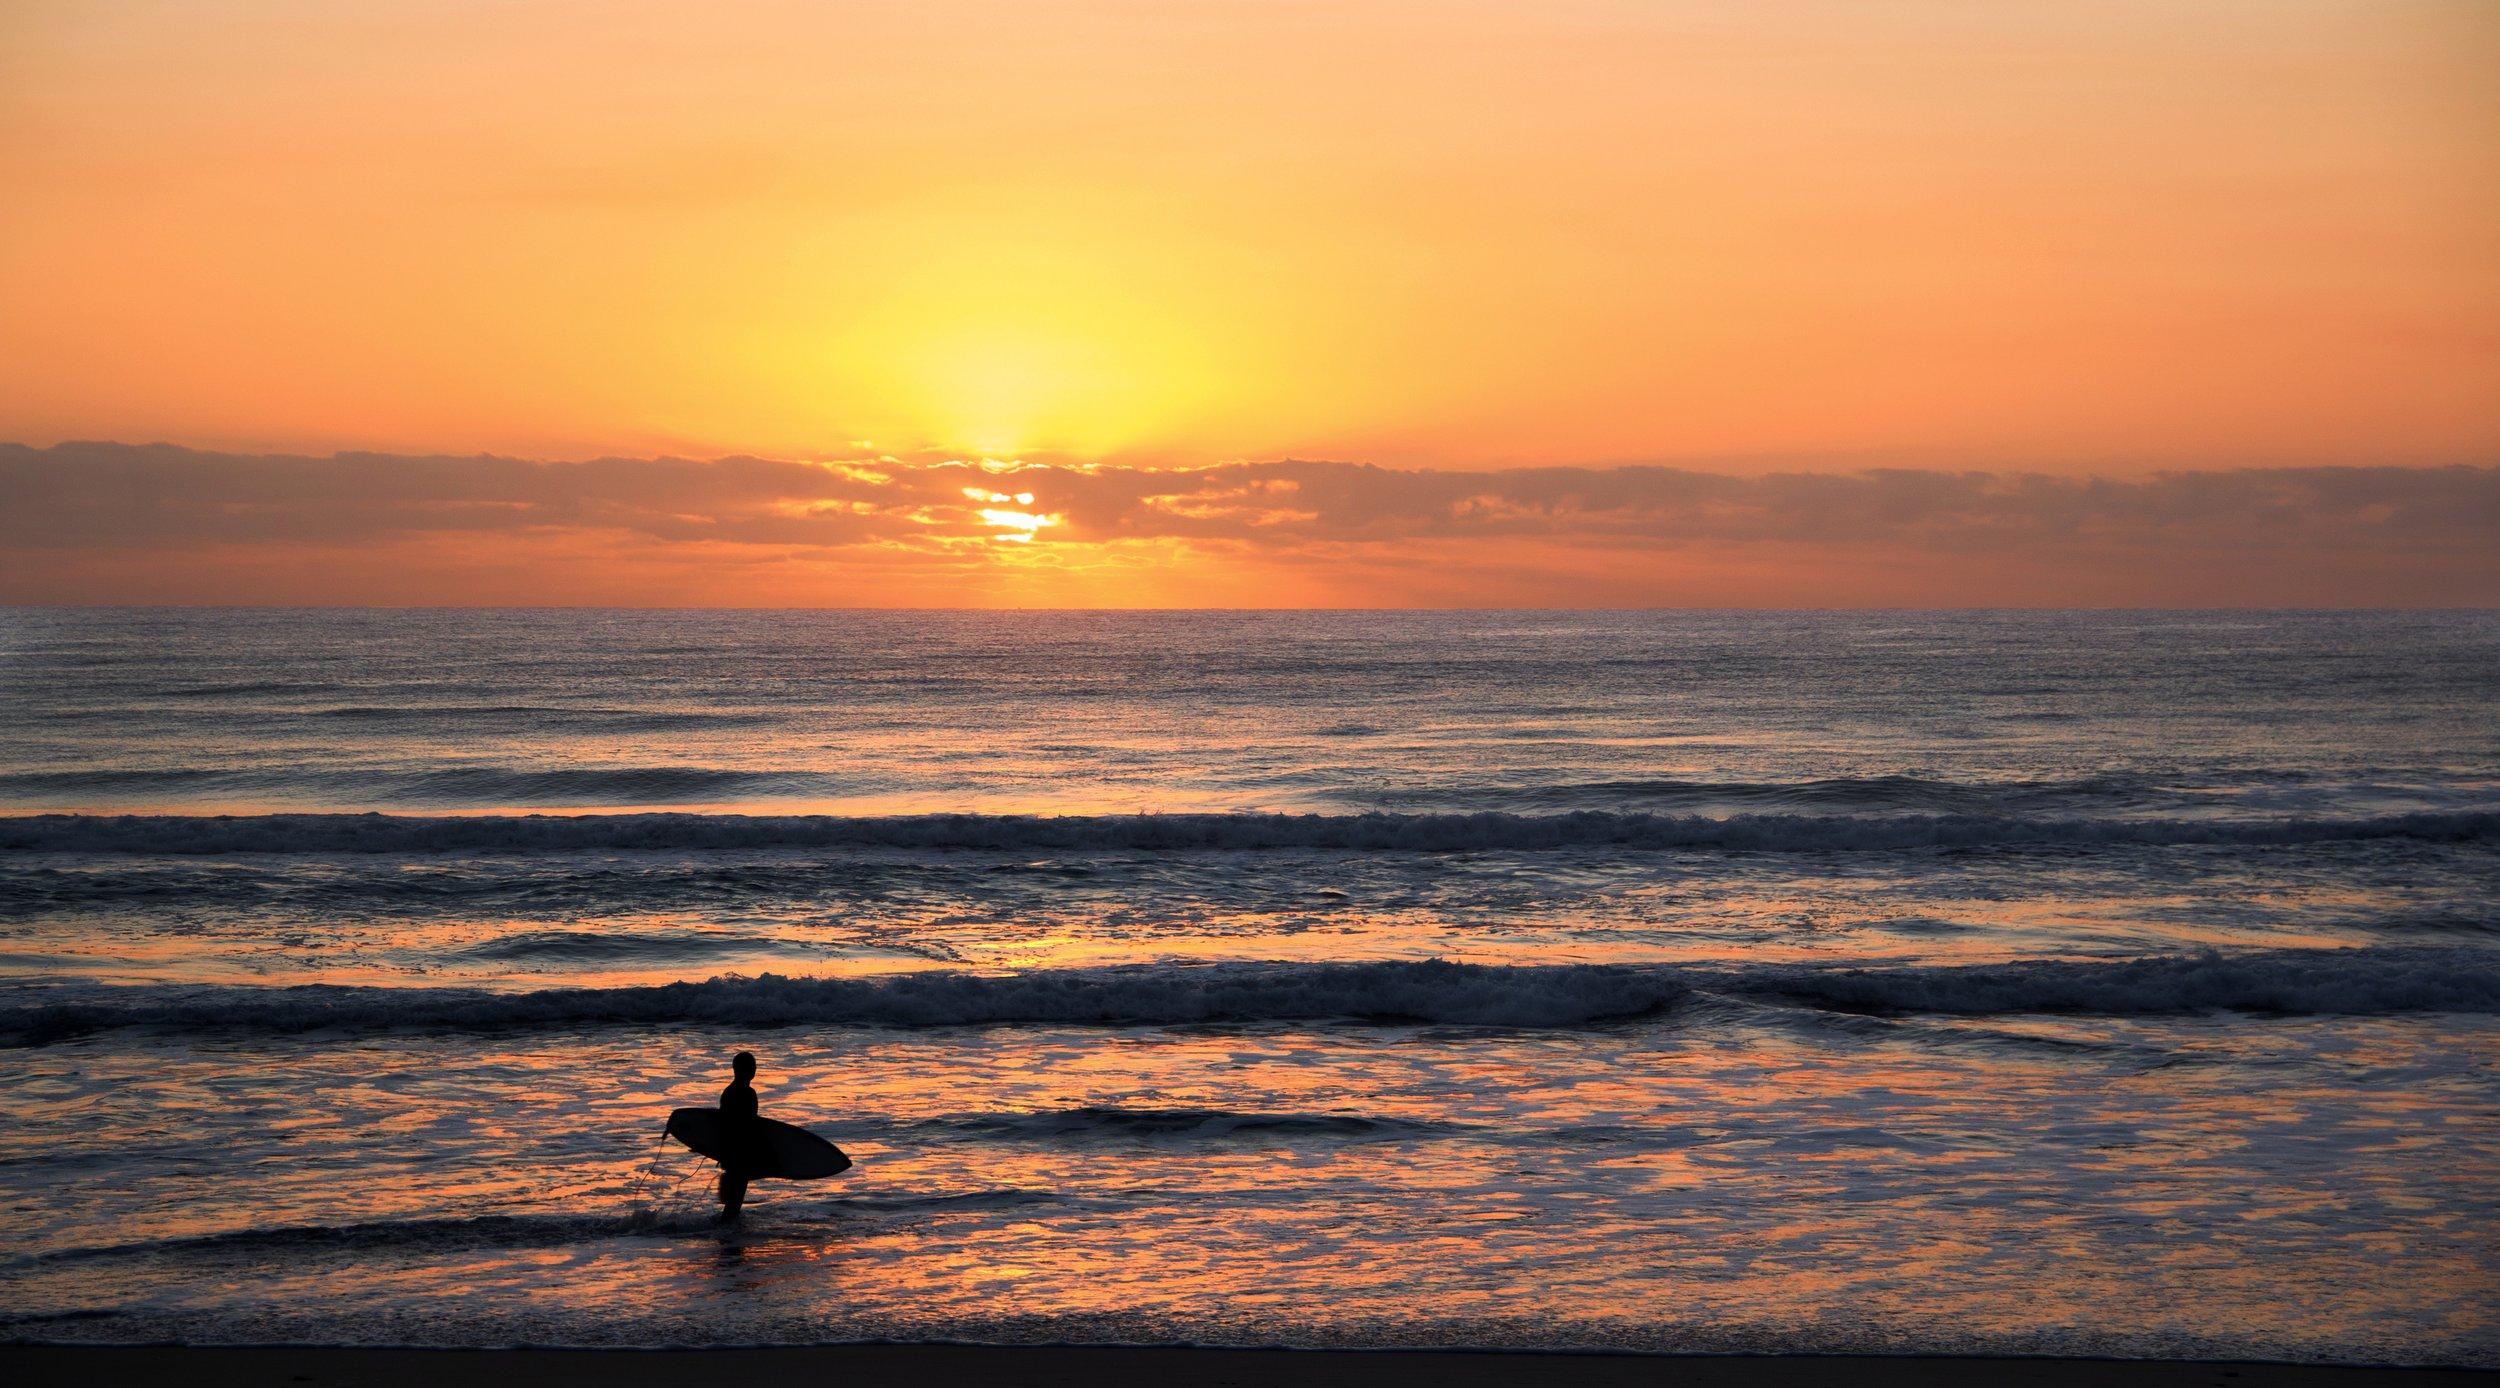 australia-backlit-beach-1089167.jpg